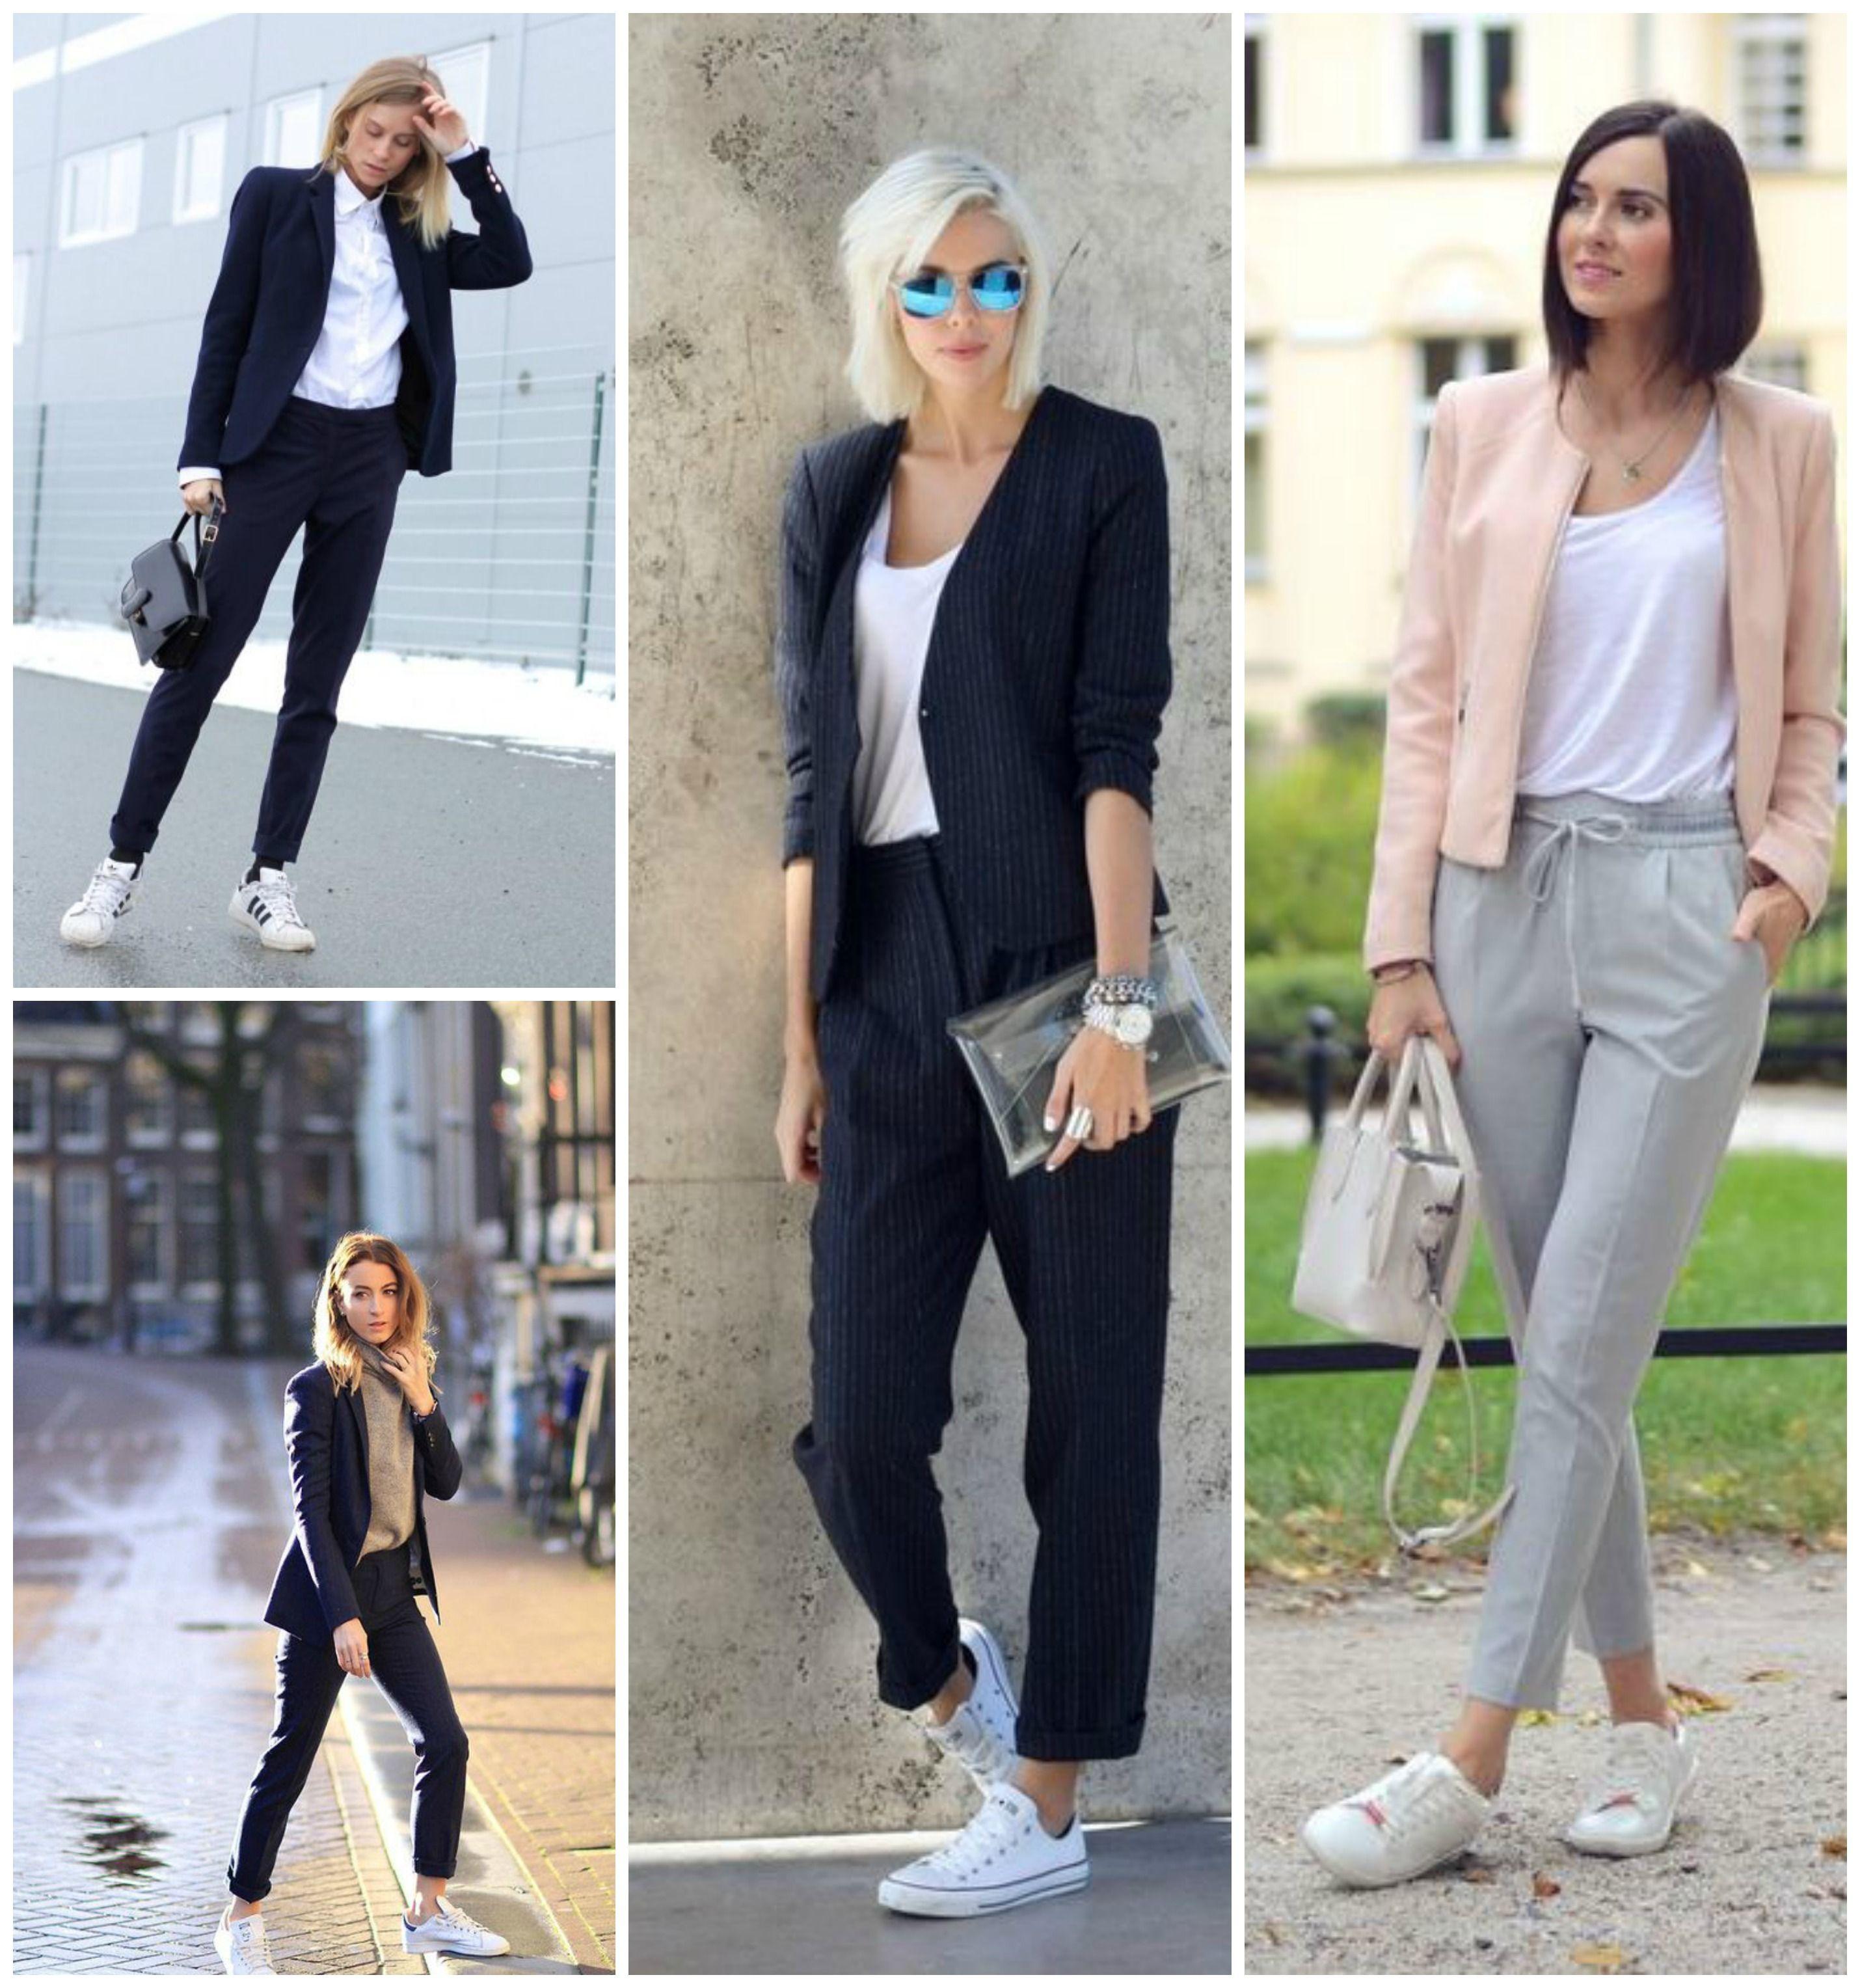 U00a1Lleva tenis a la oficina! u2013 Mundo Rosa | Looks fem con zapas | Pinterest | Ootd Jean outfits ...